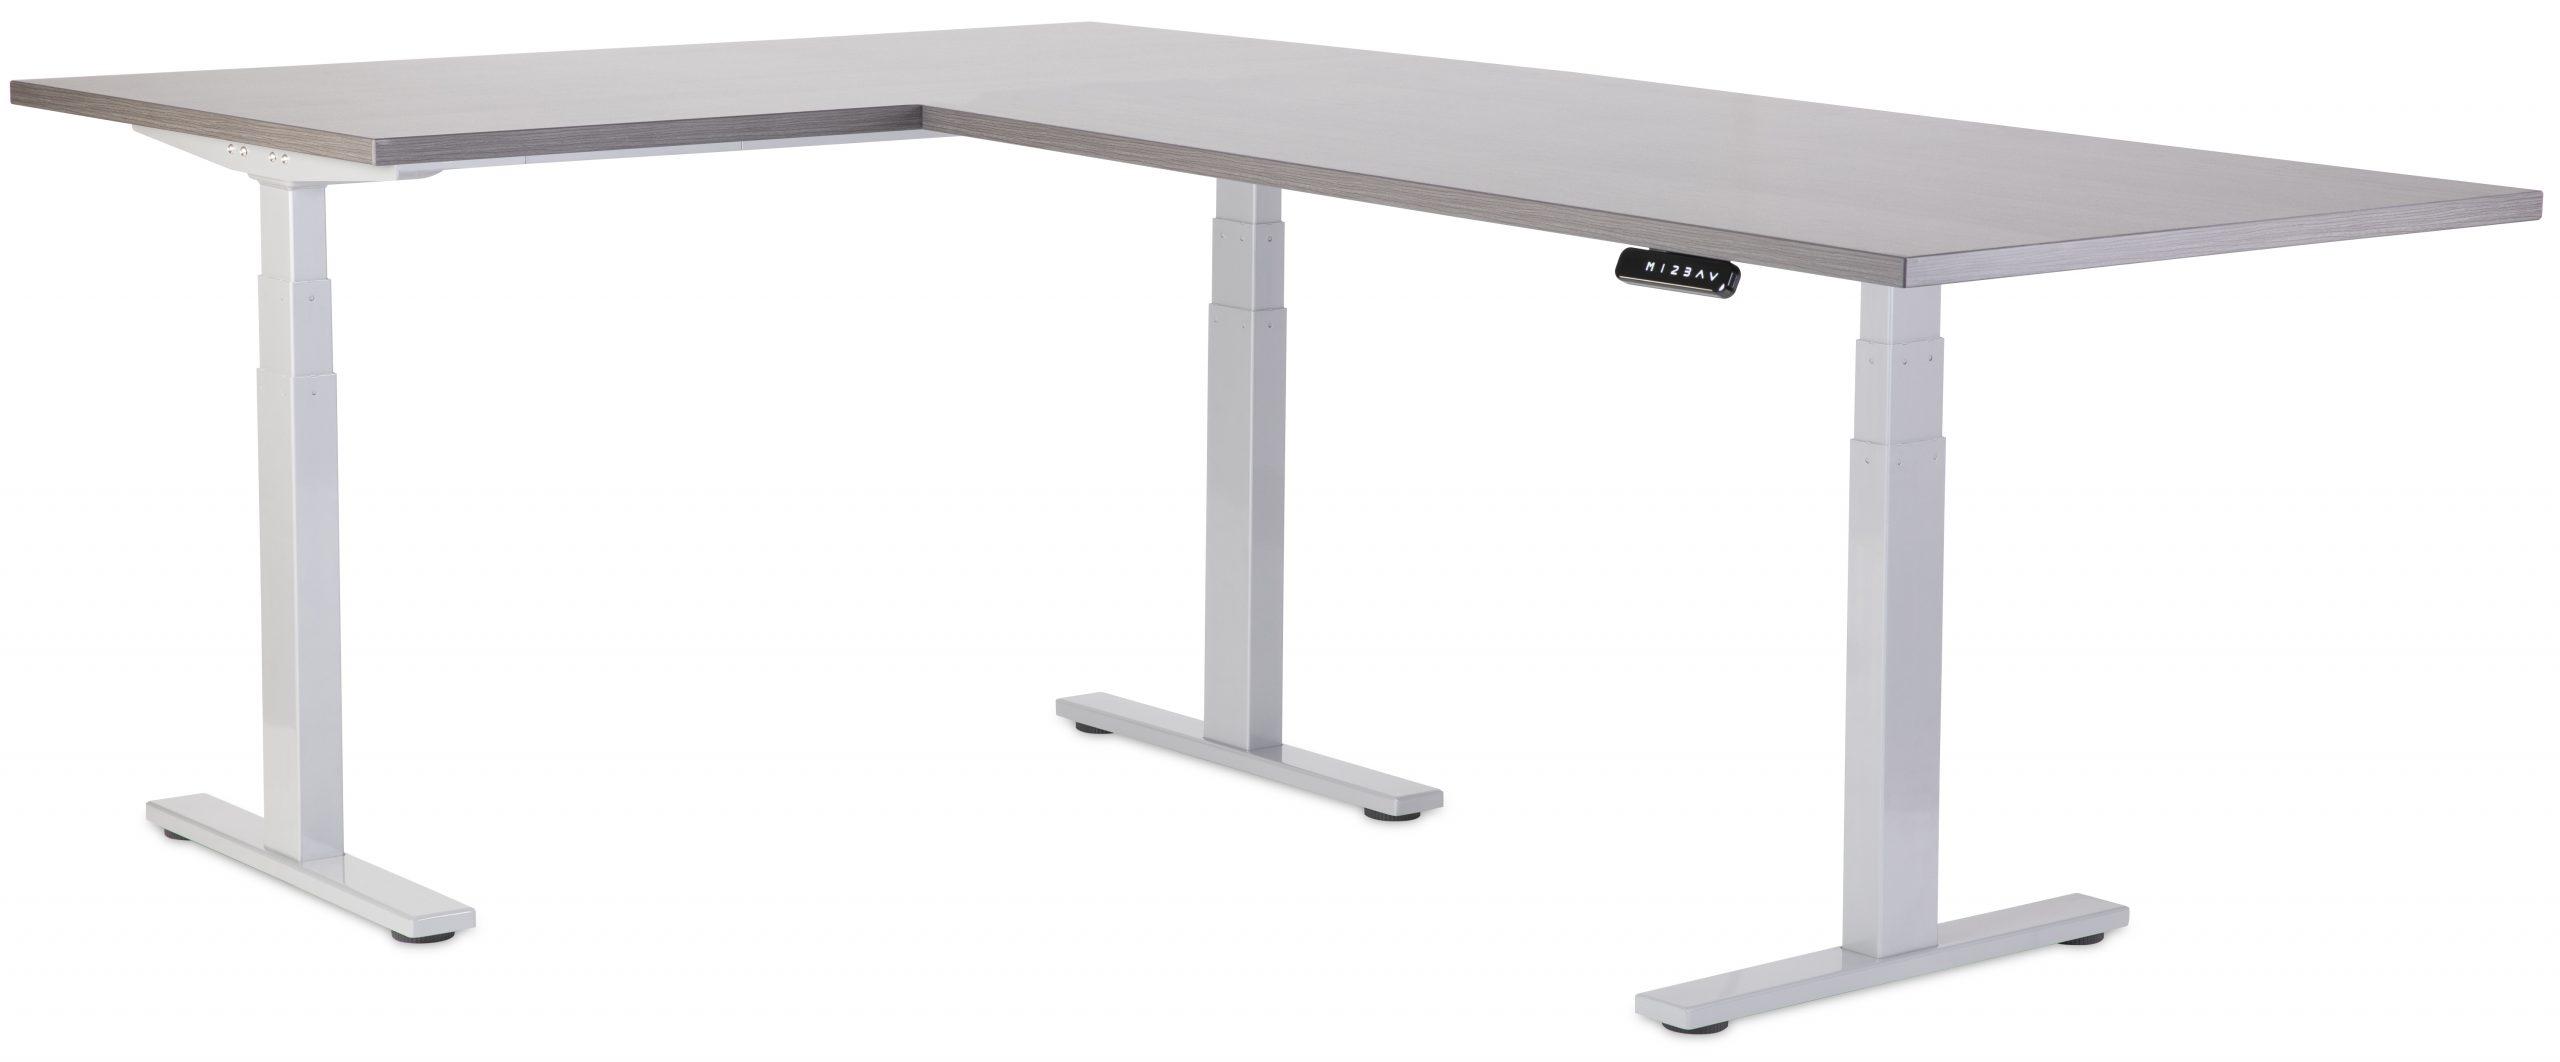 VFlex Standing Desk Grey with Grey Desktop Low Position